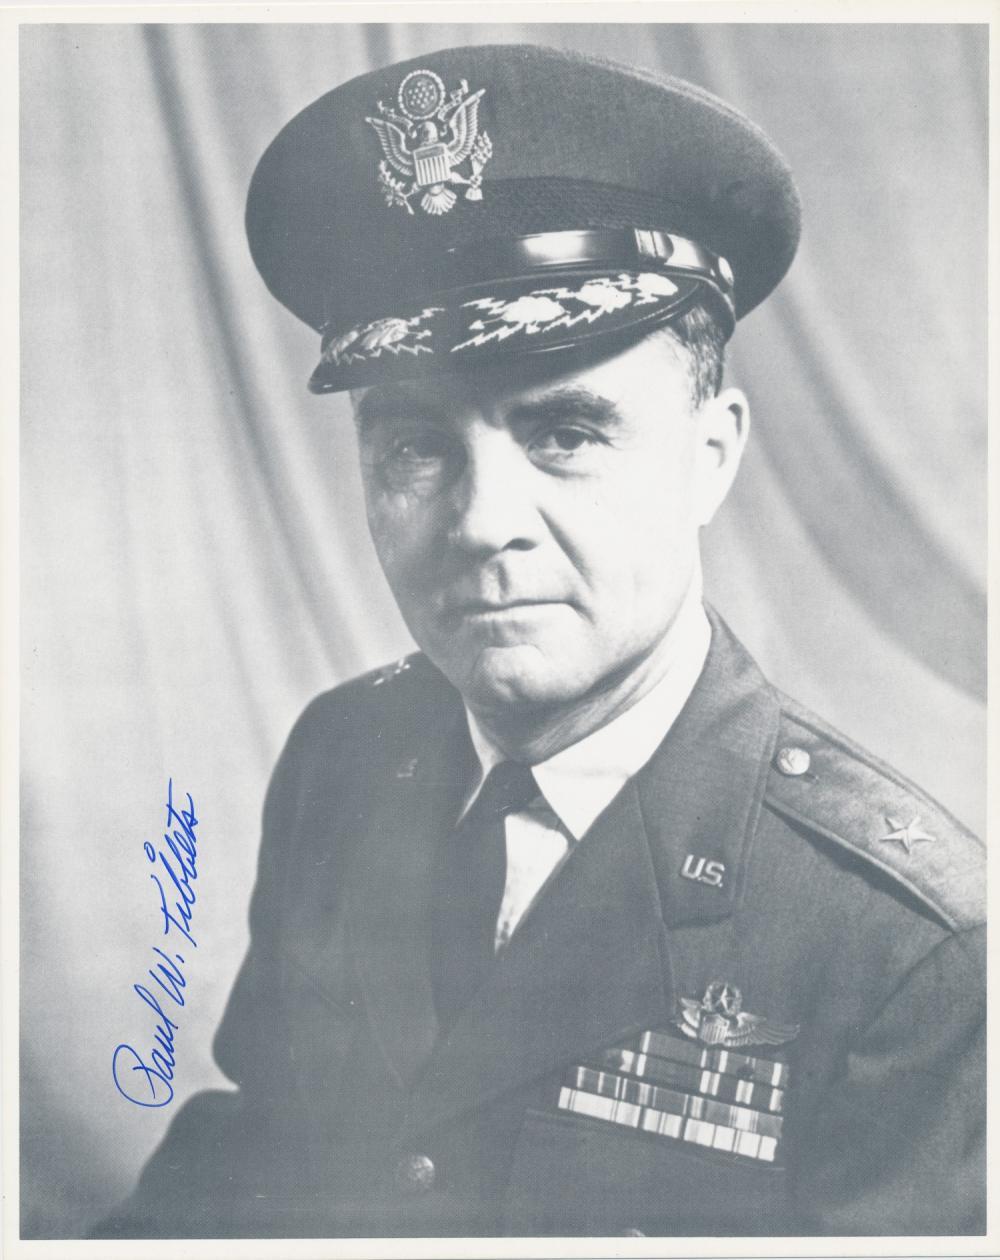 PAUL W. TIBBETS